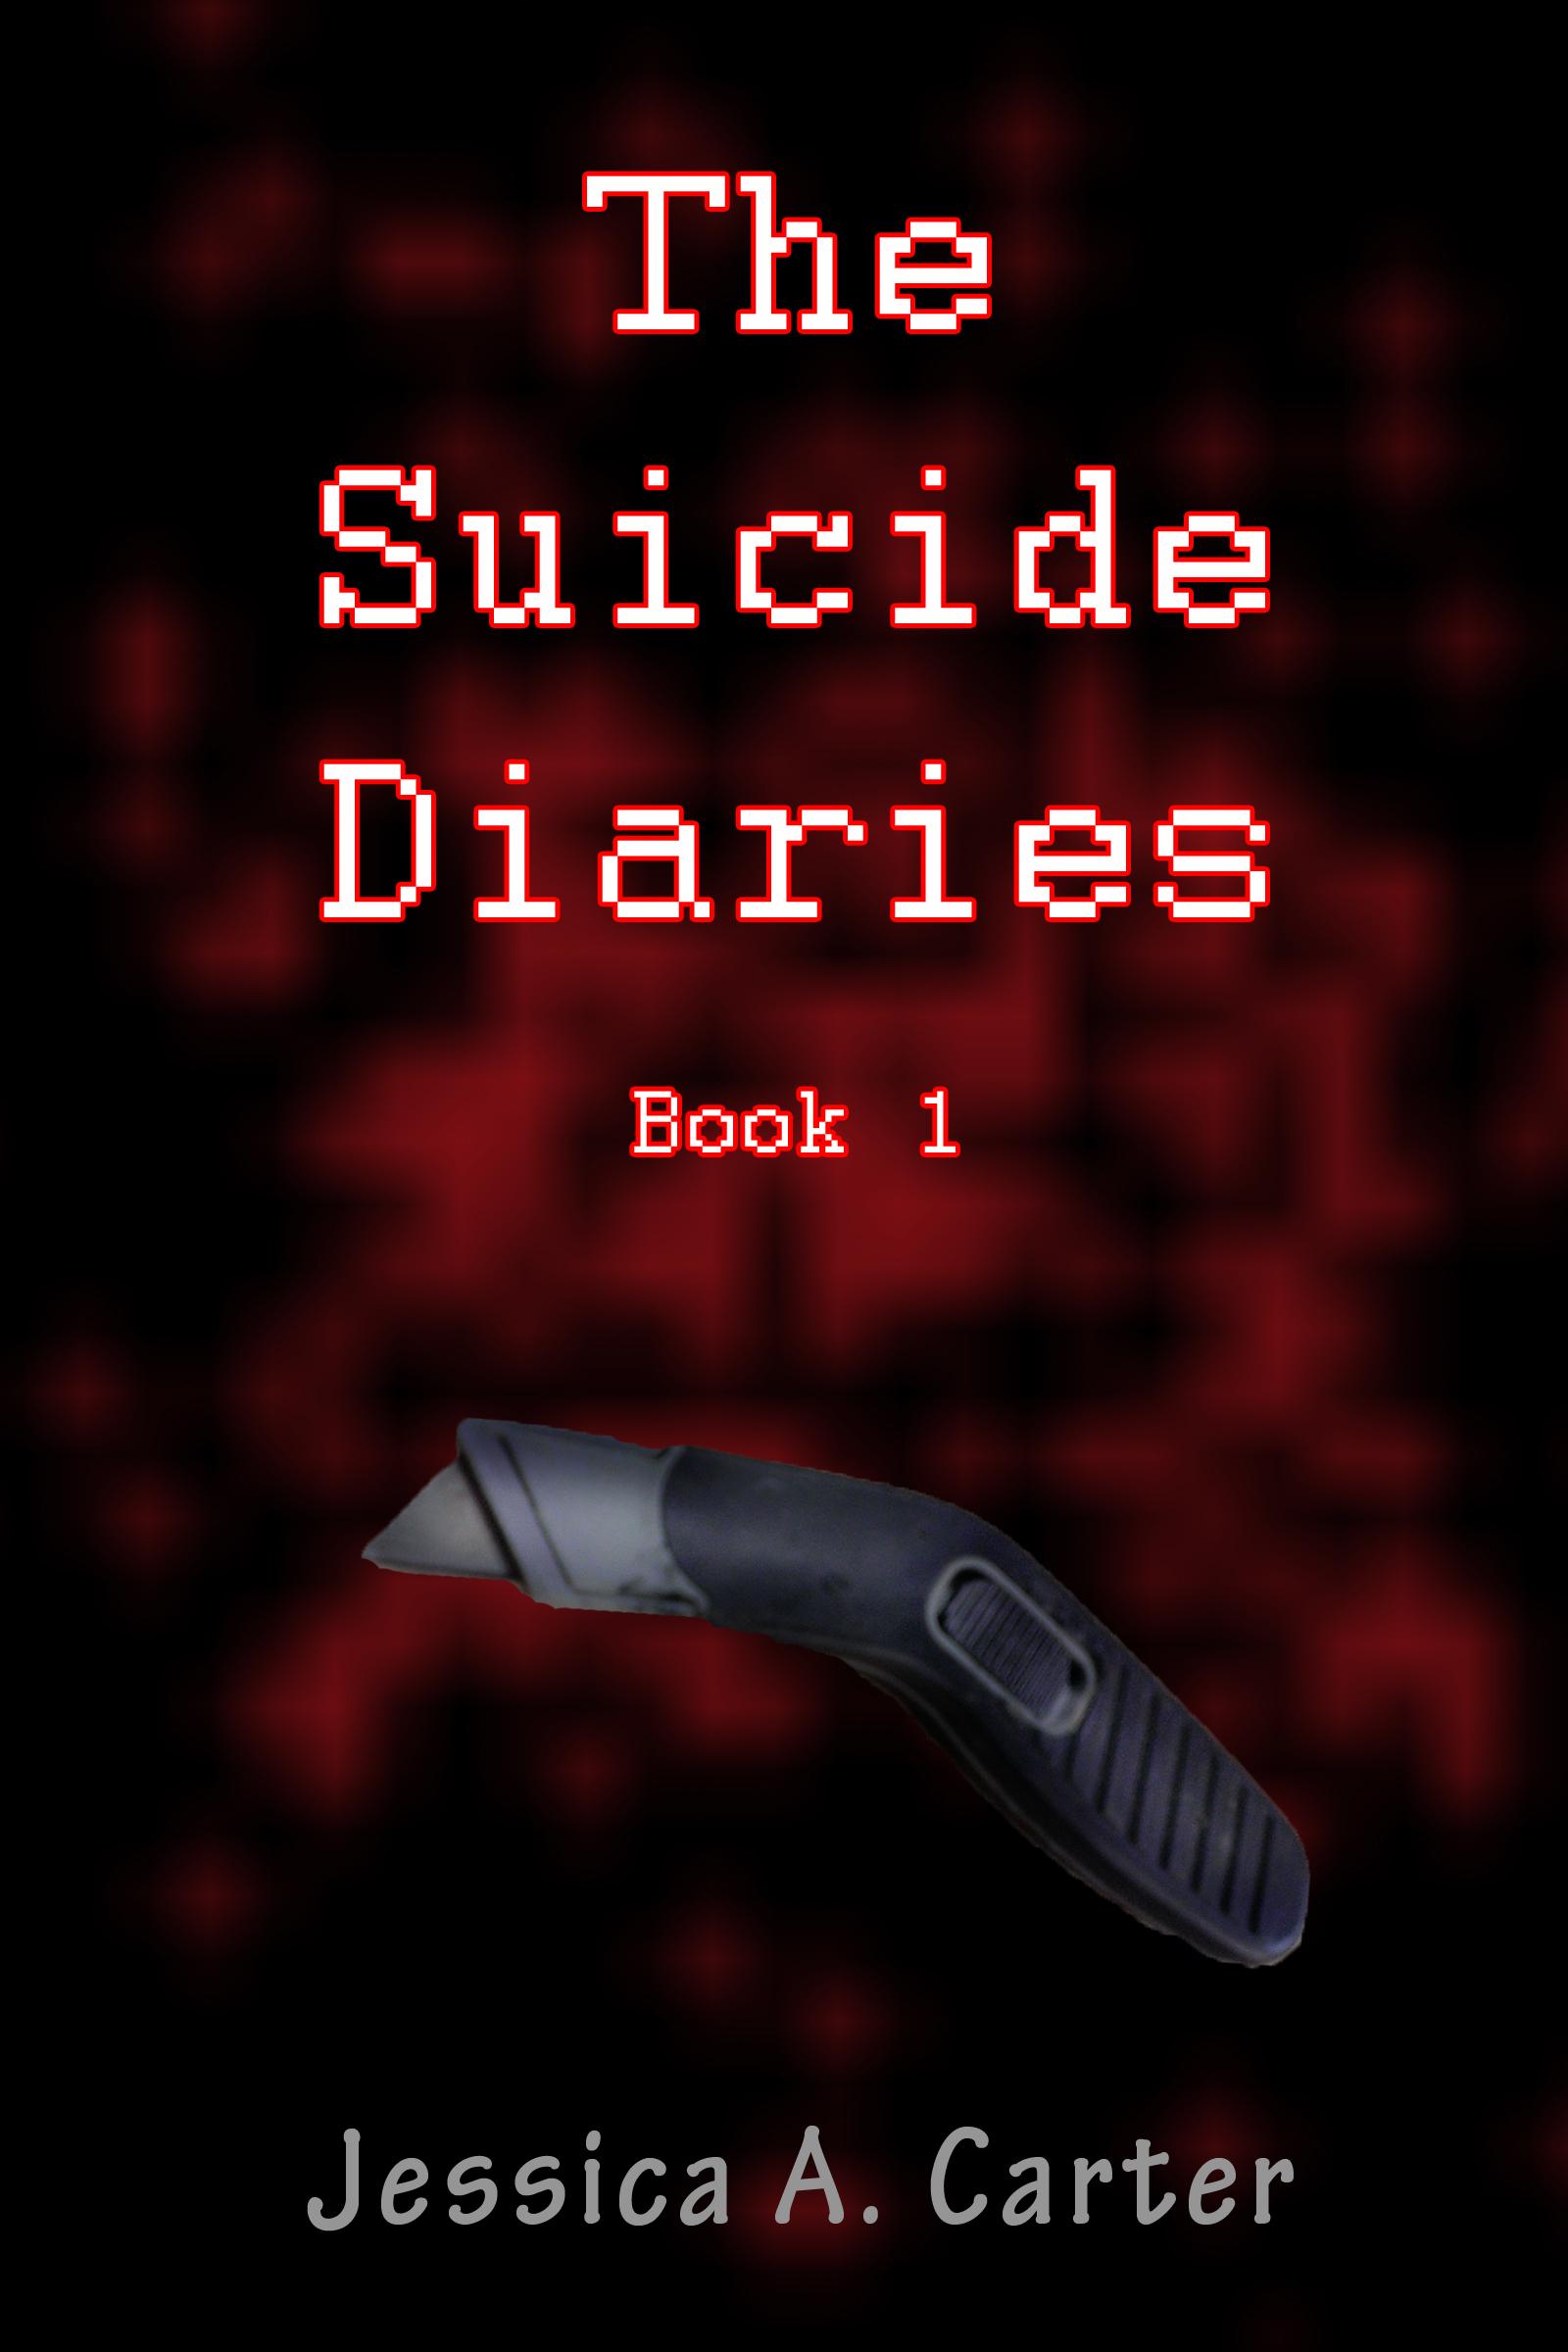 The Suicide Diaries (Book 1) (sst-cccxv)